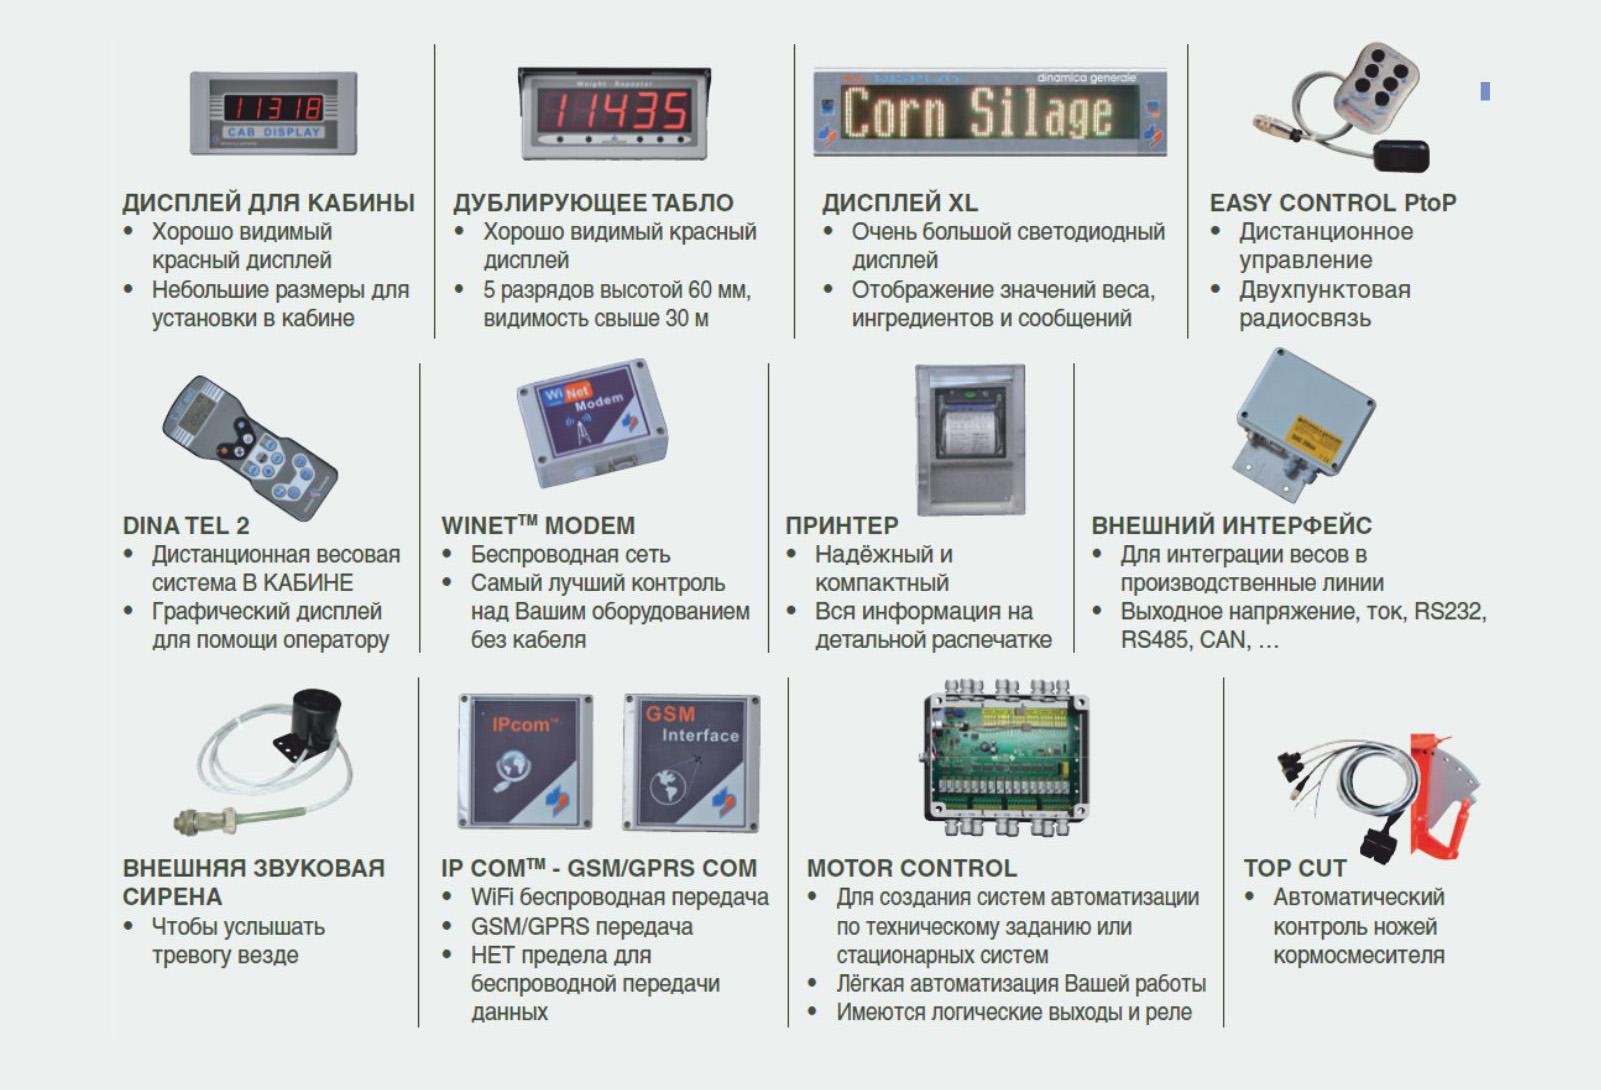 DG8000-IC/SB C ПО DTM И 3G  ves_dop_opcii